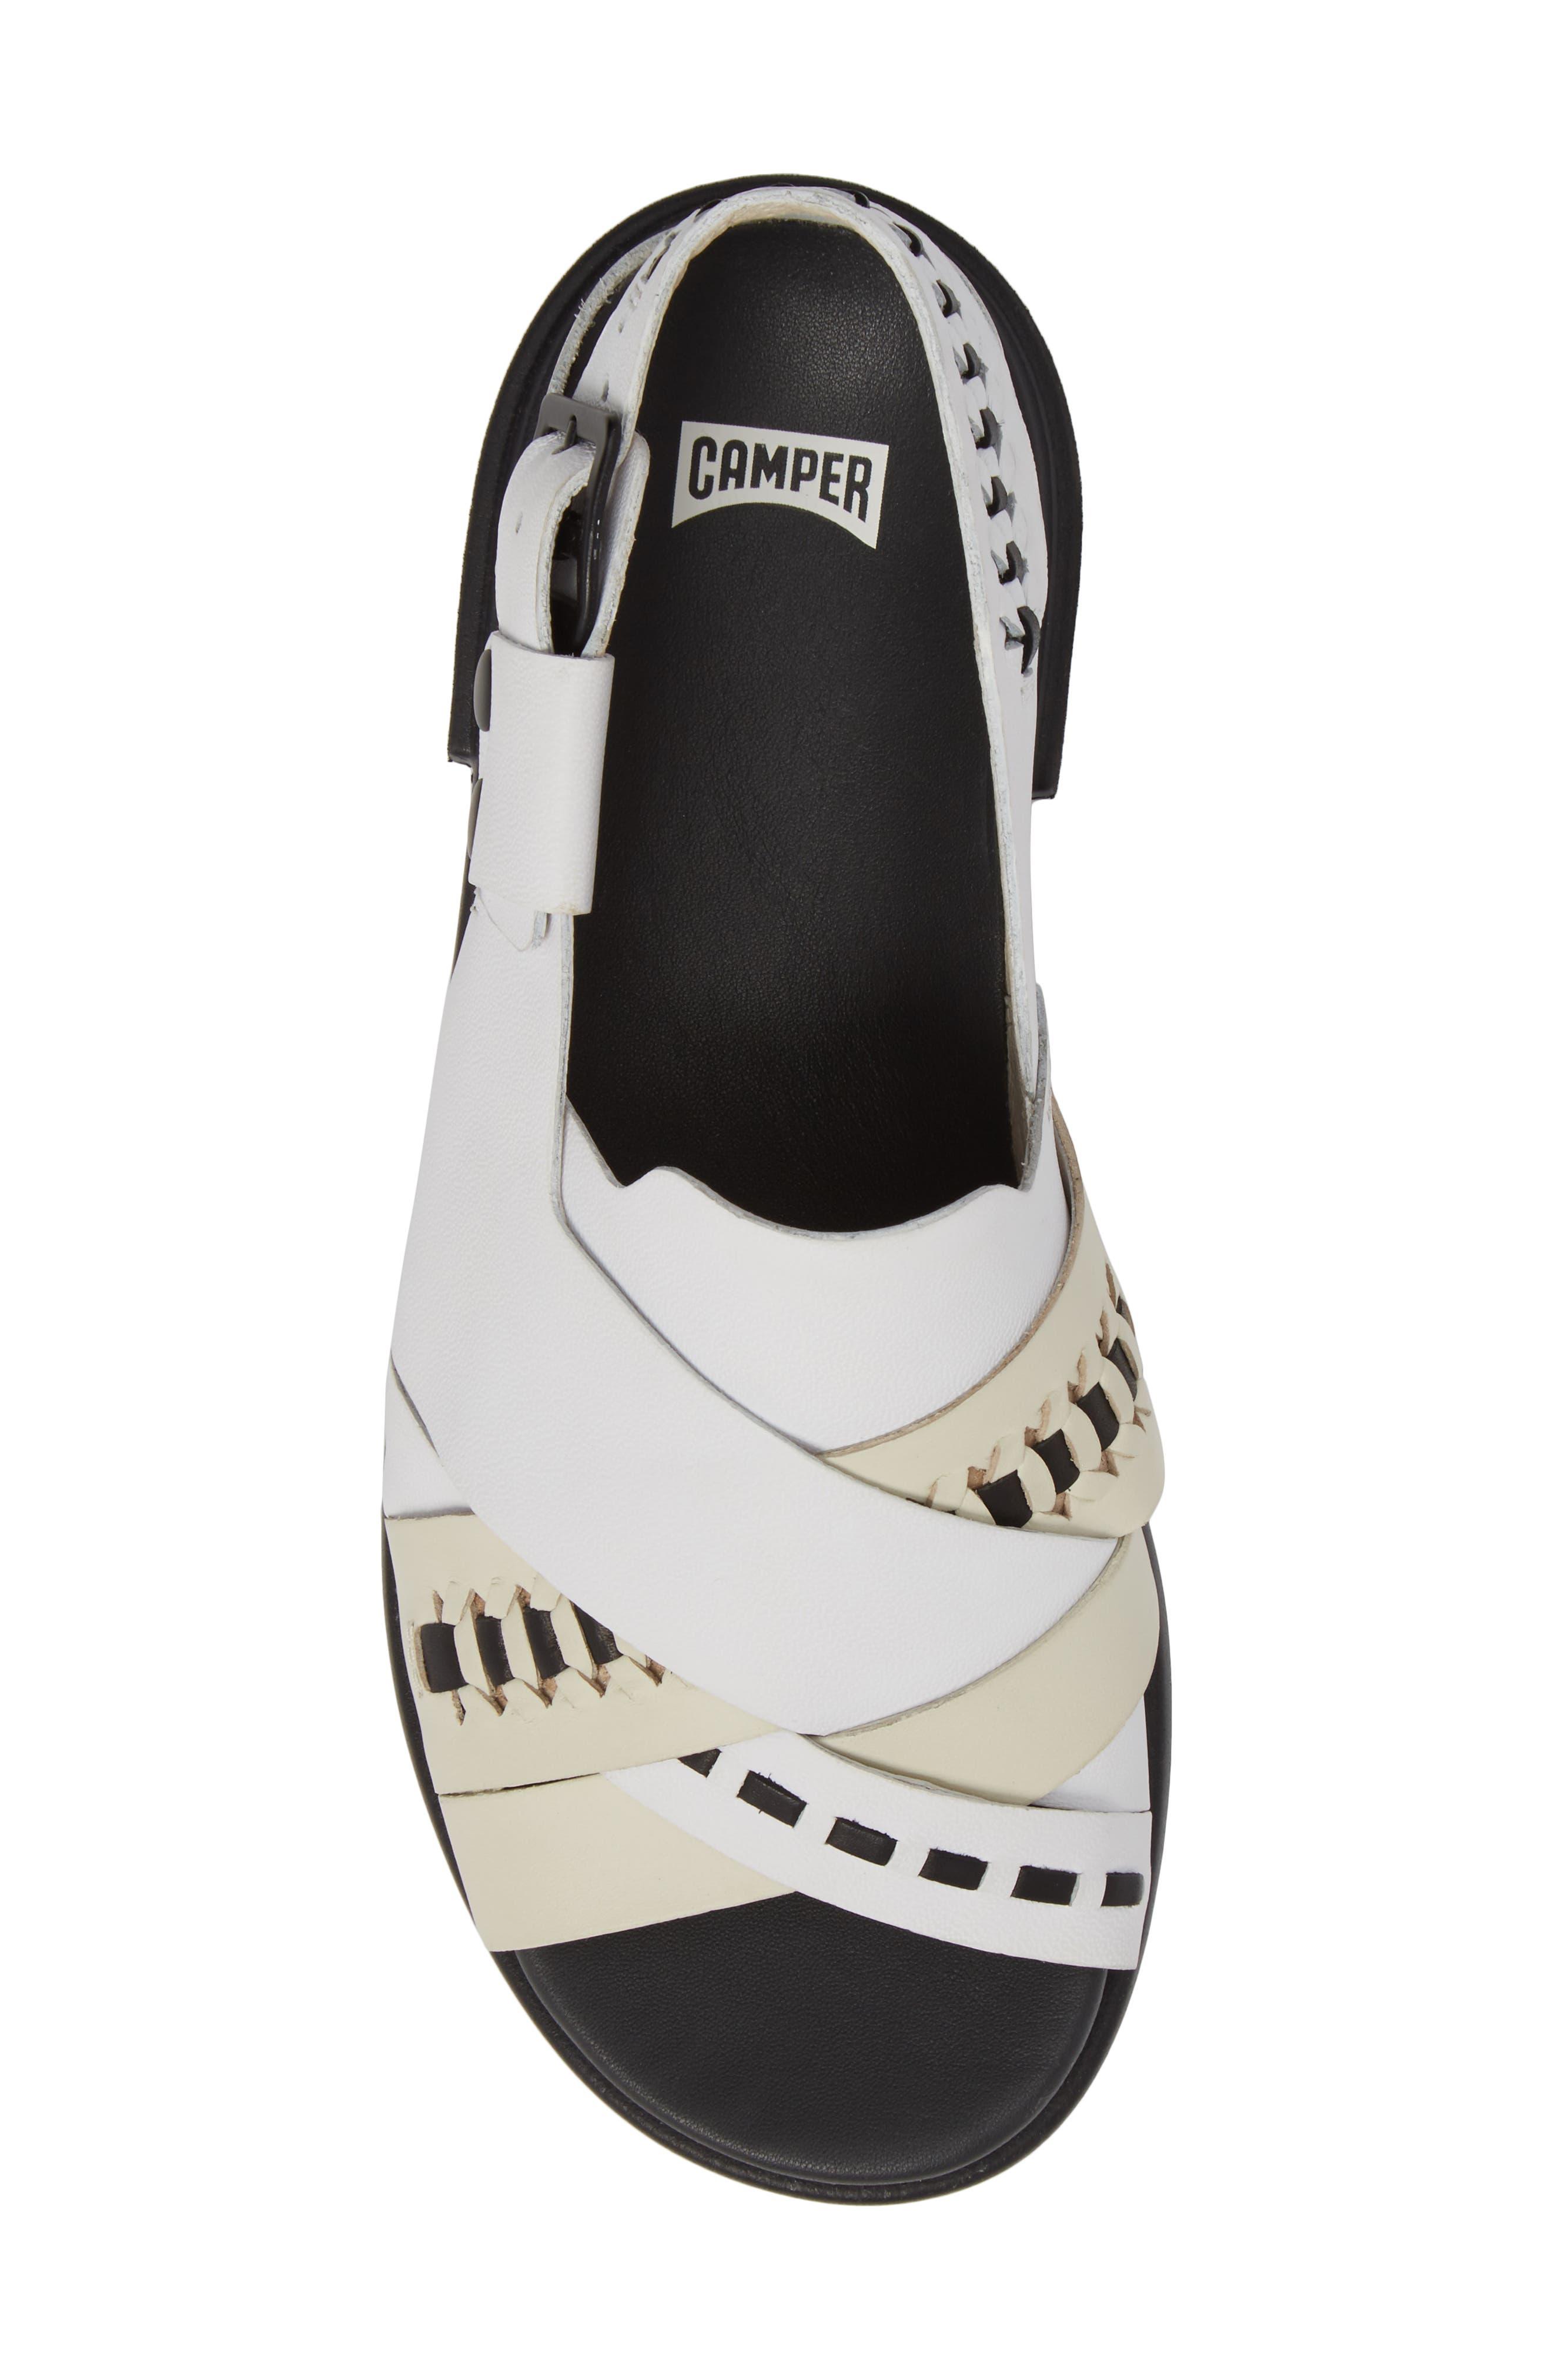 Twins Slingback Sandal,                             Alternate thumbnail 6, color,                             Multi - Assorted Leather